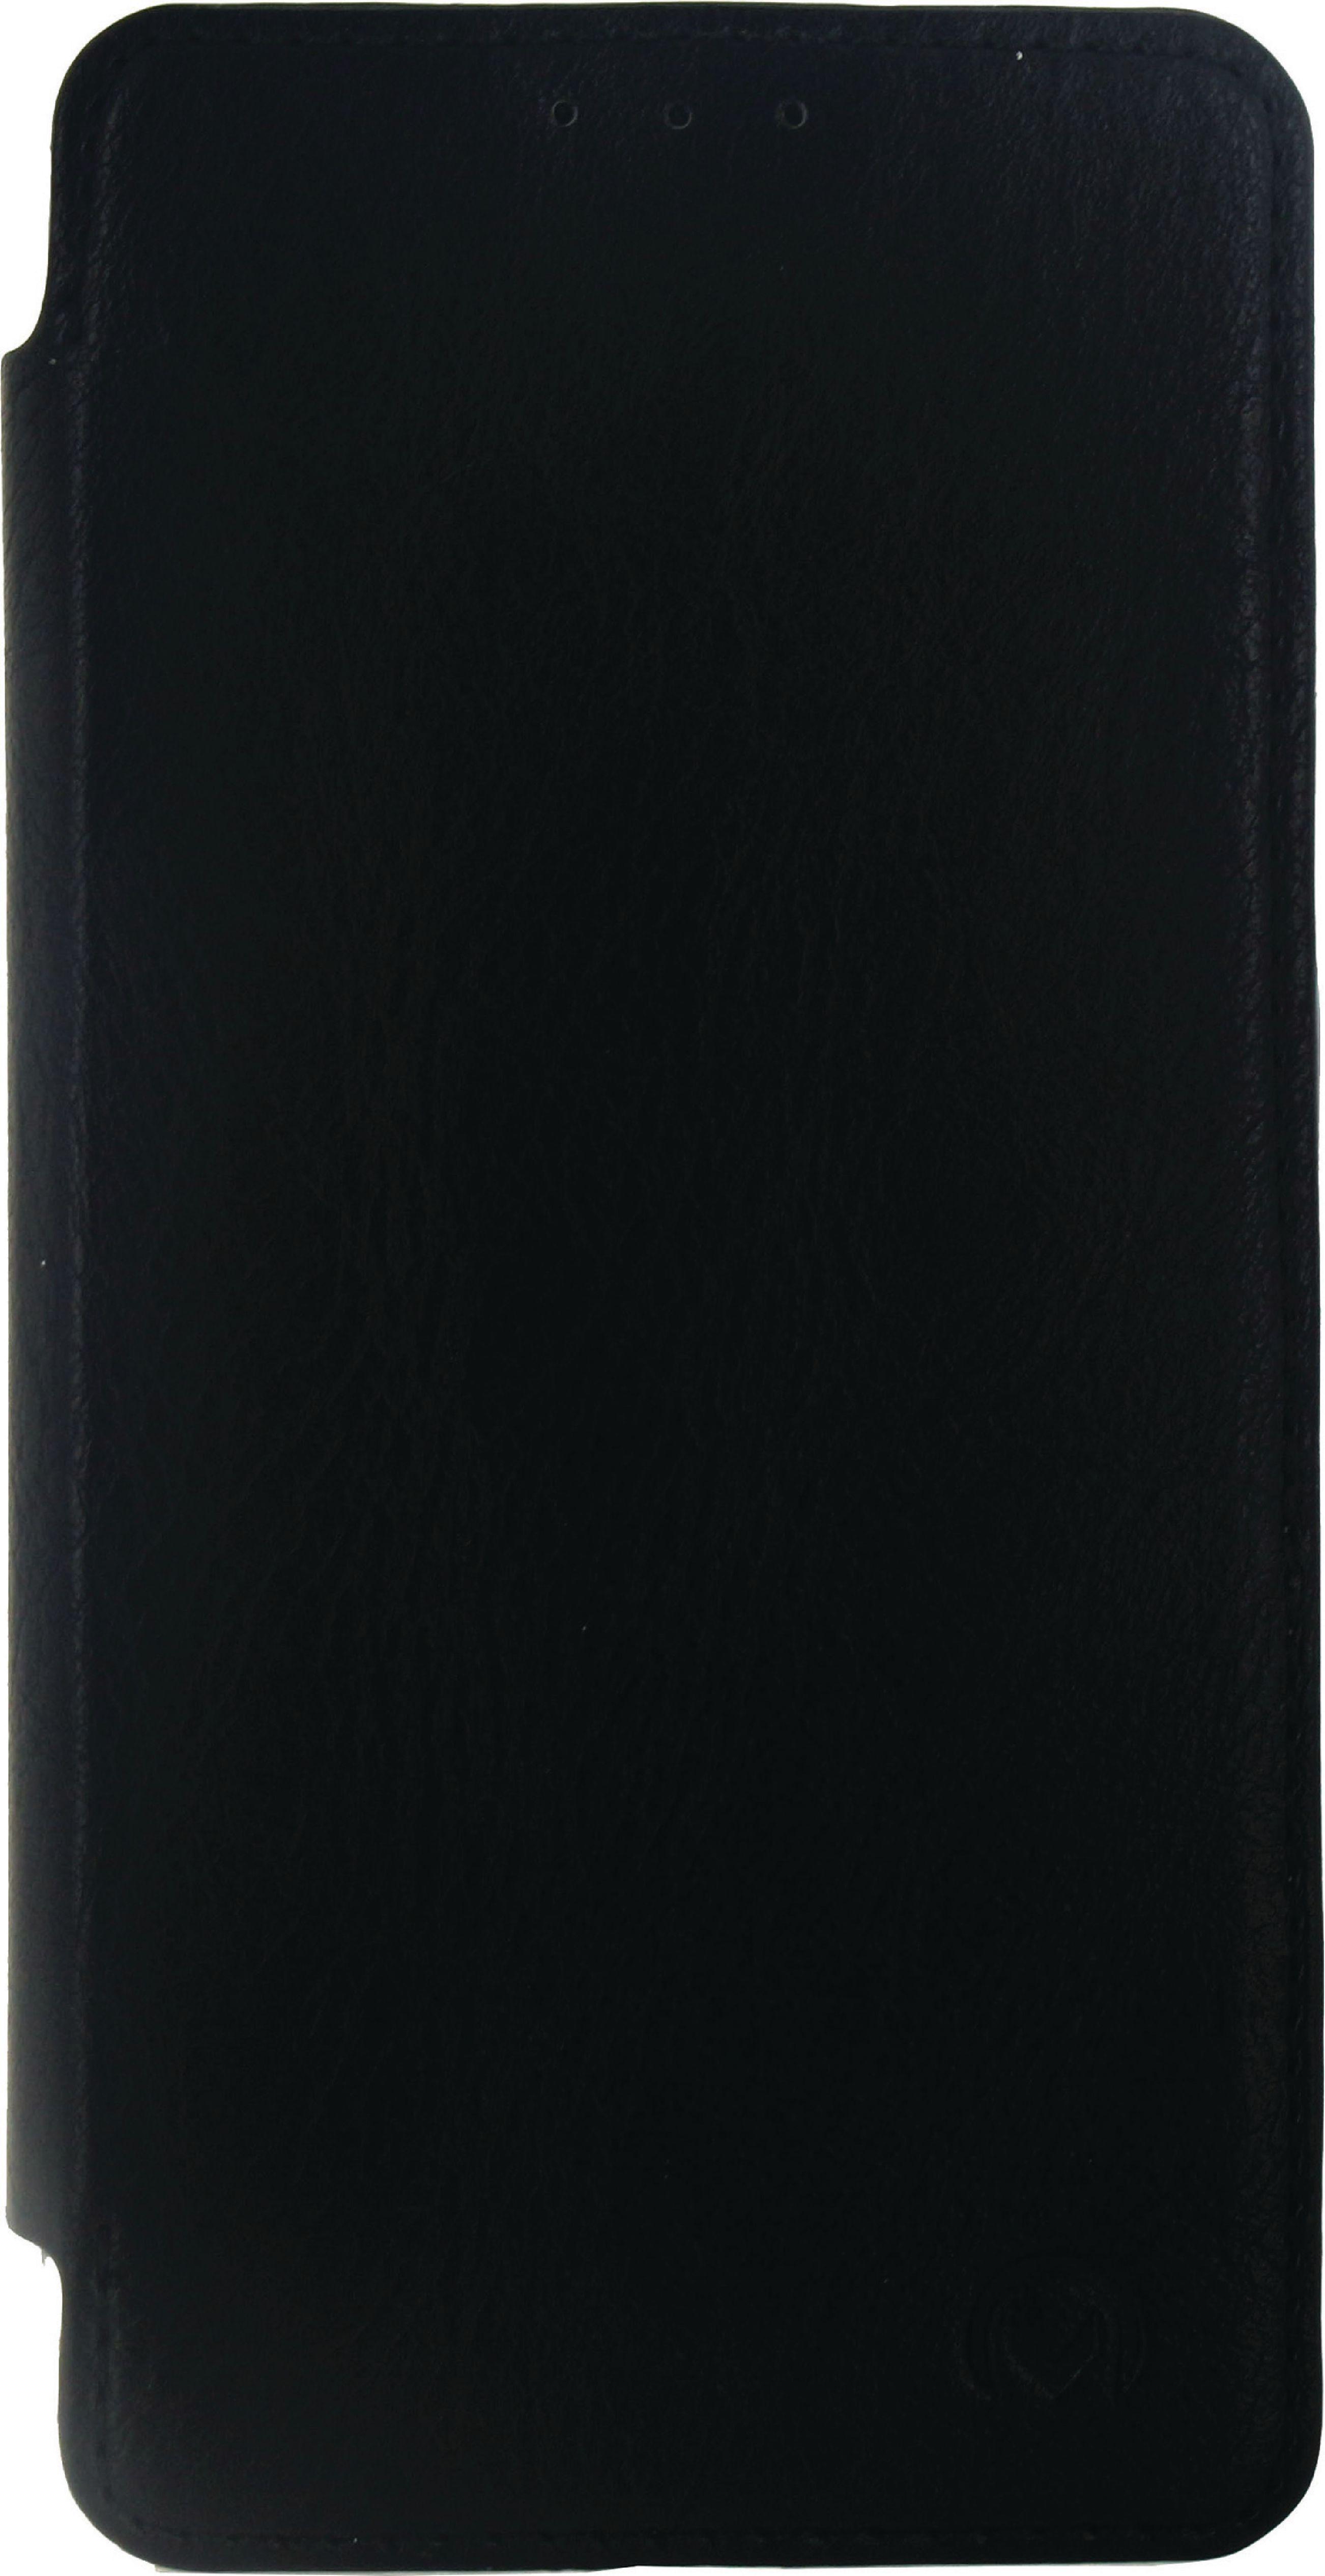 Image of   Telefon Slankt Bogetui Samsung Galaxy A5 2016 Sort